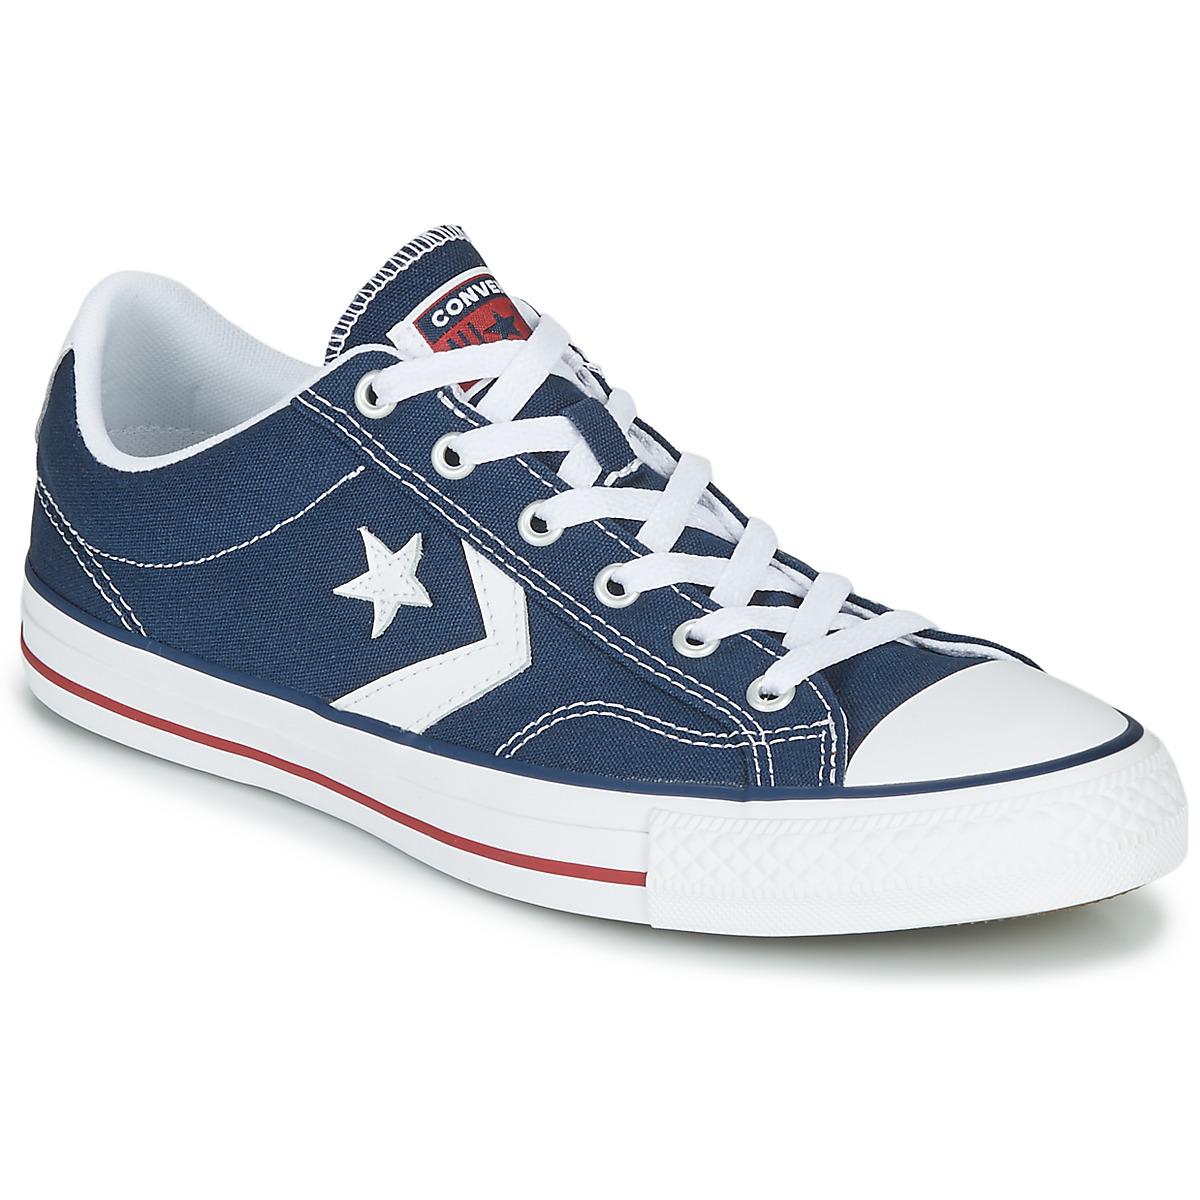 chaussure converse prix